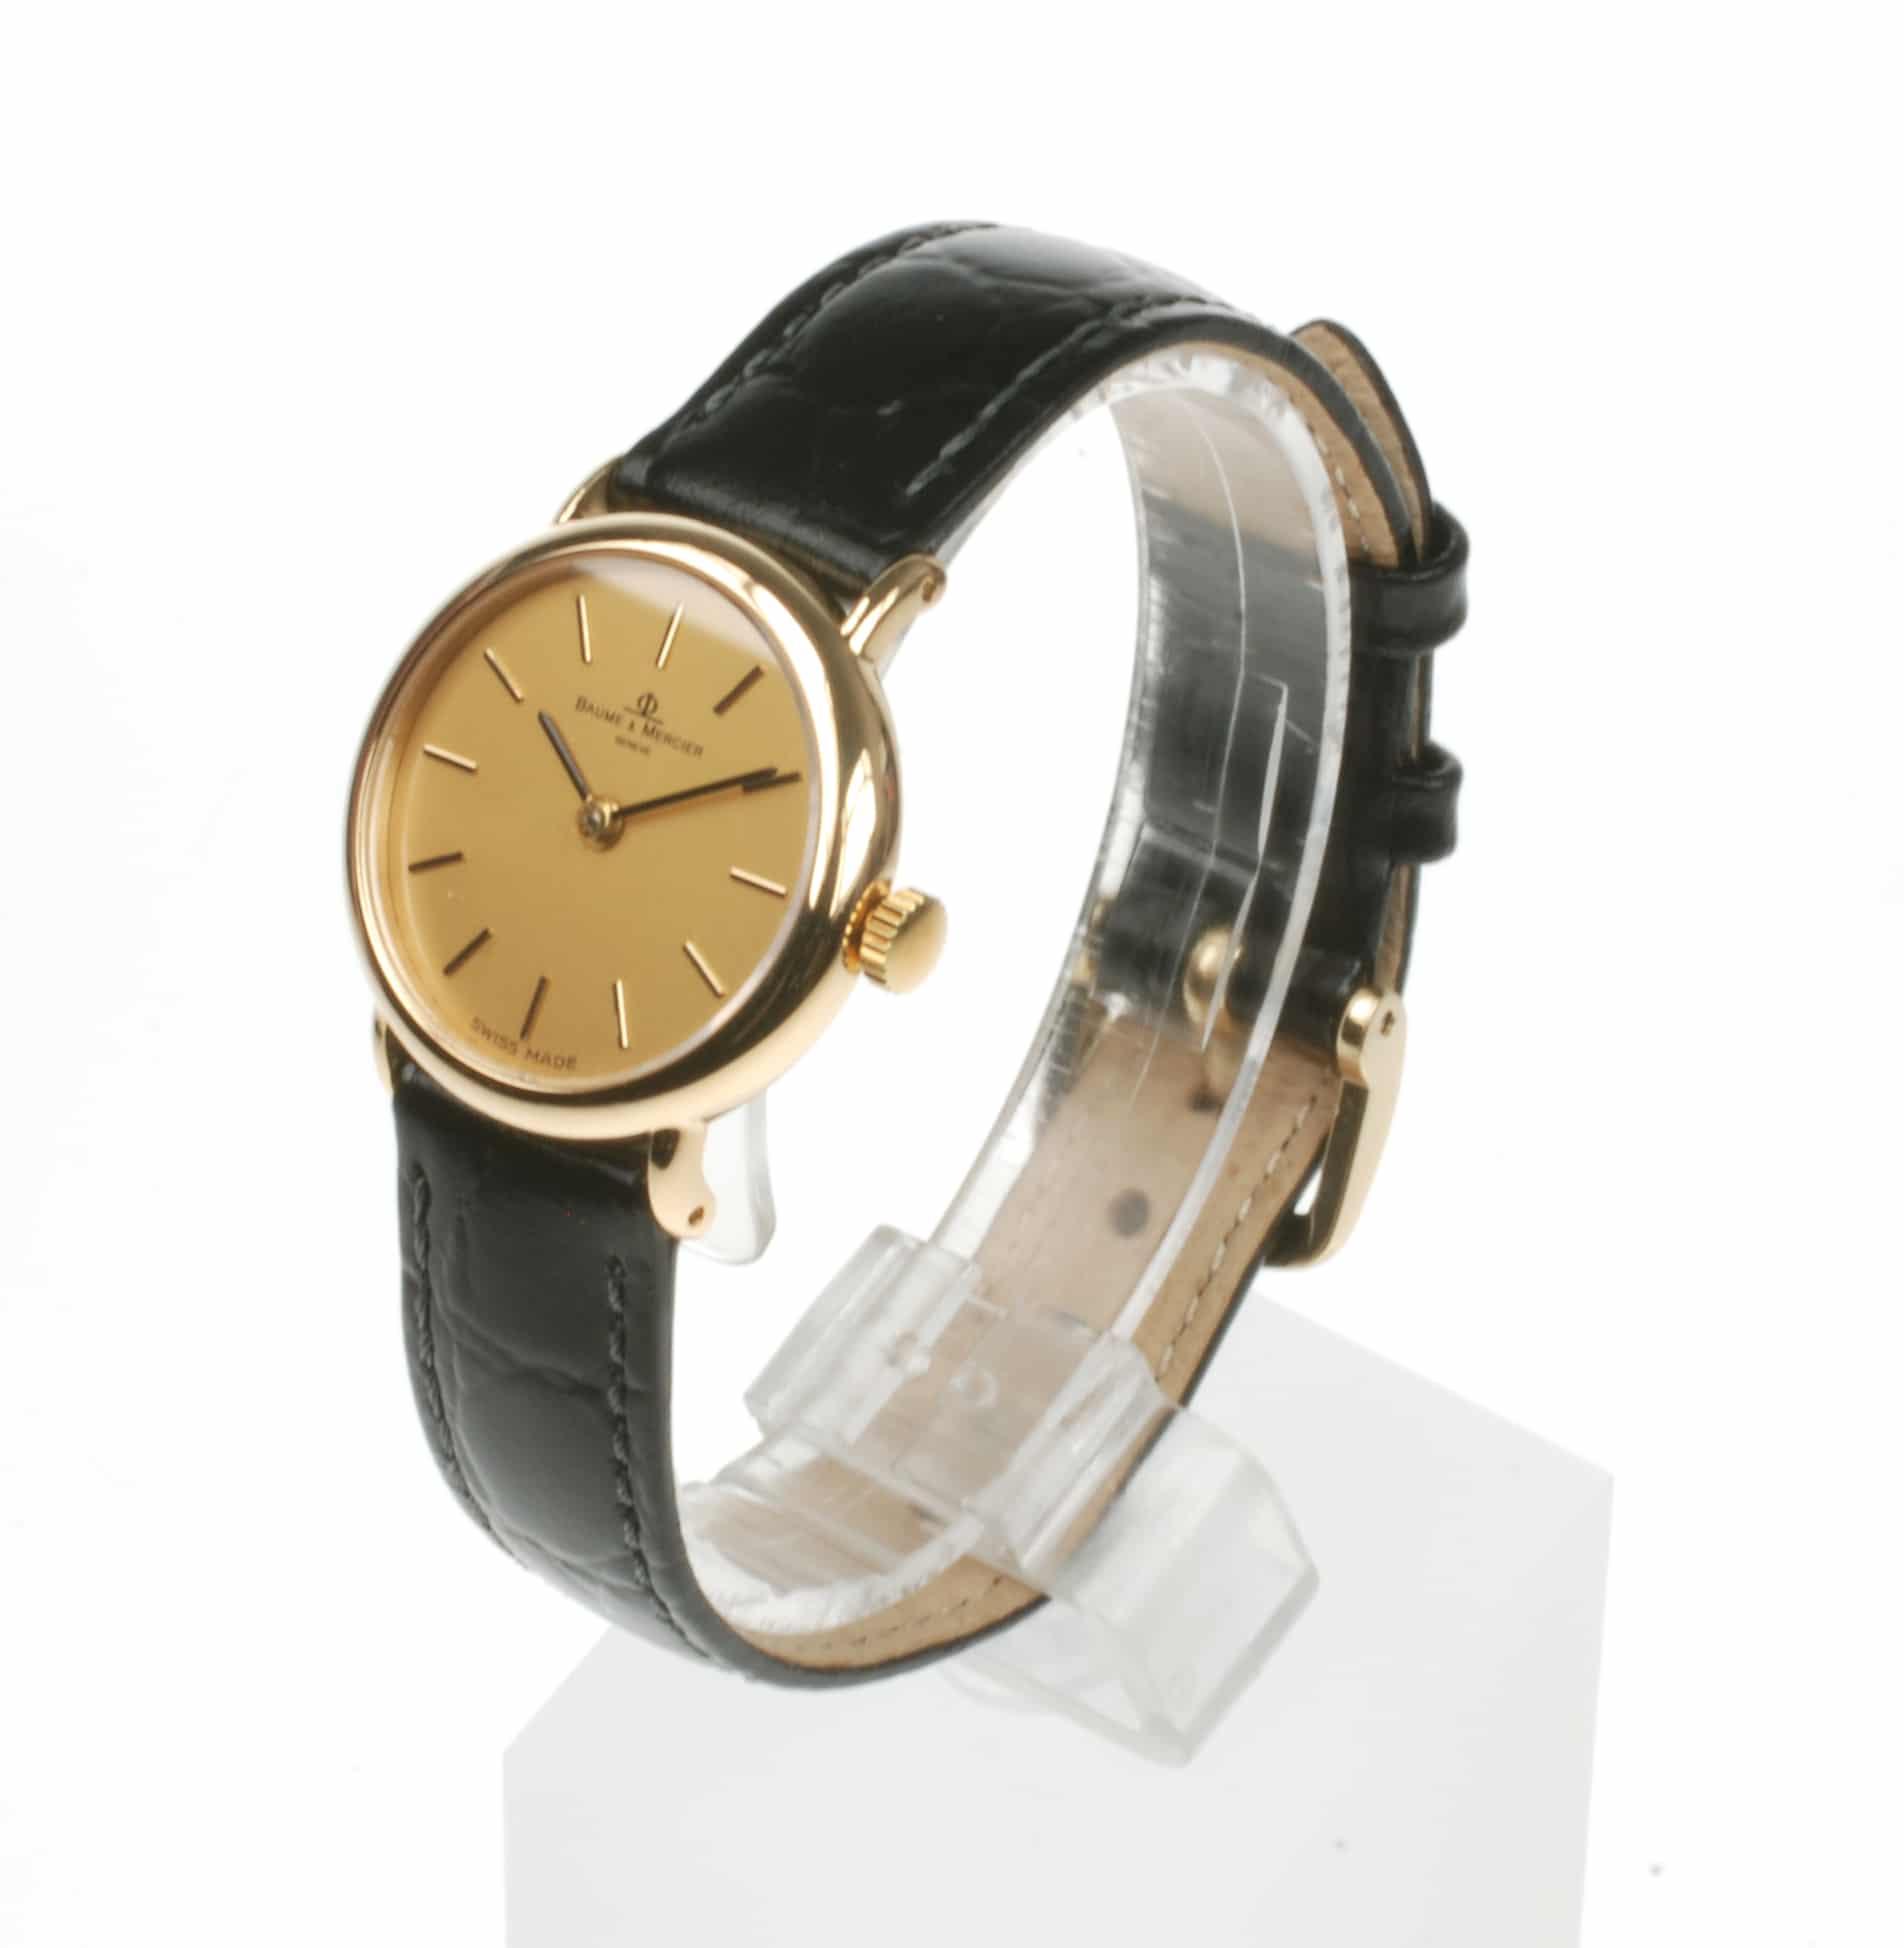 Baume & Mercier Preowned Watch